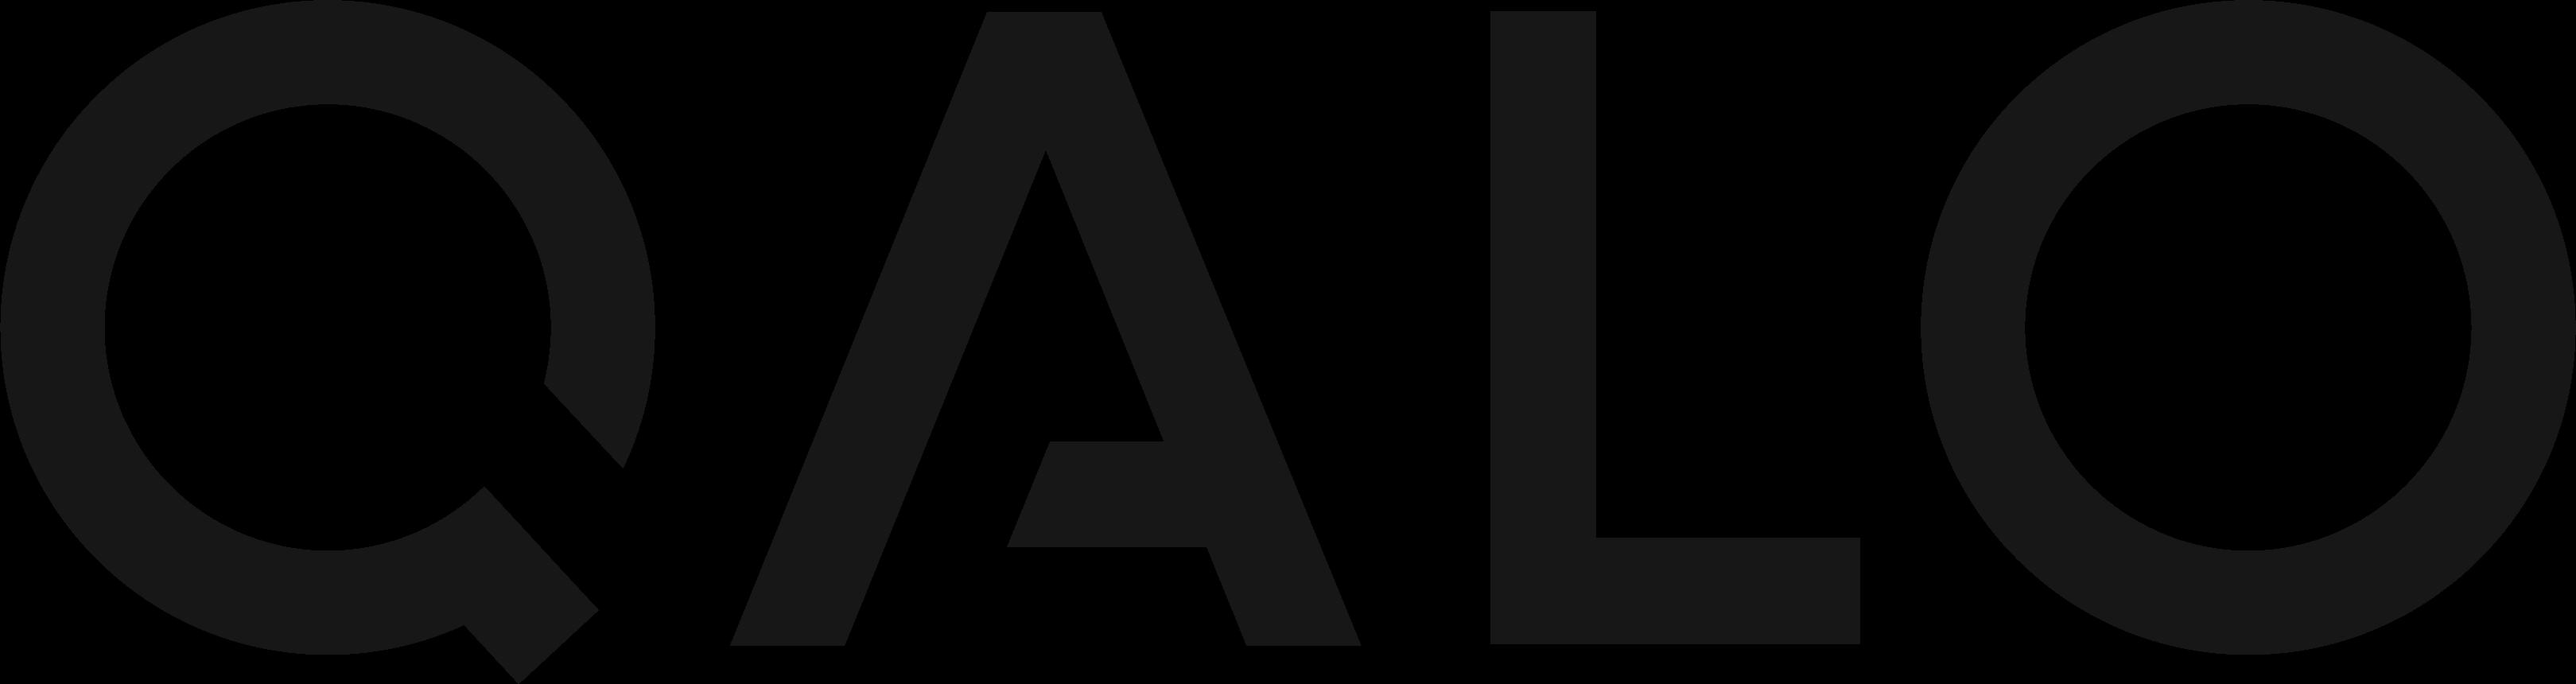 SUM20-QALO-Logo-Partners-Module